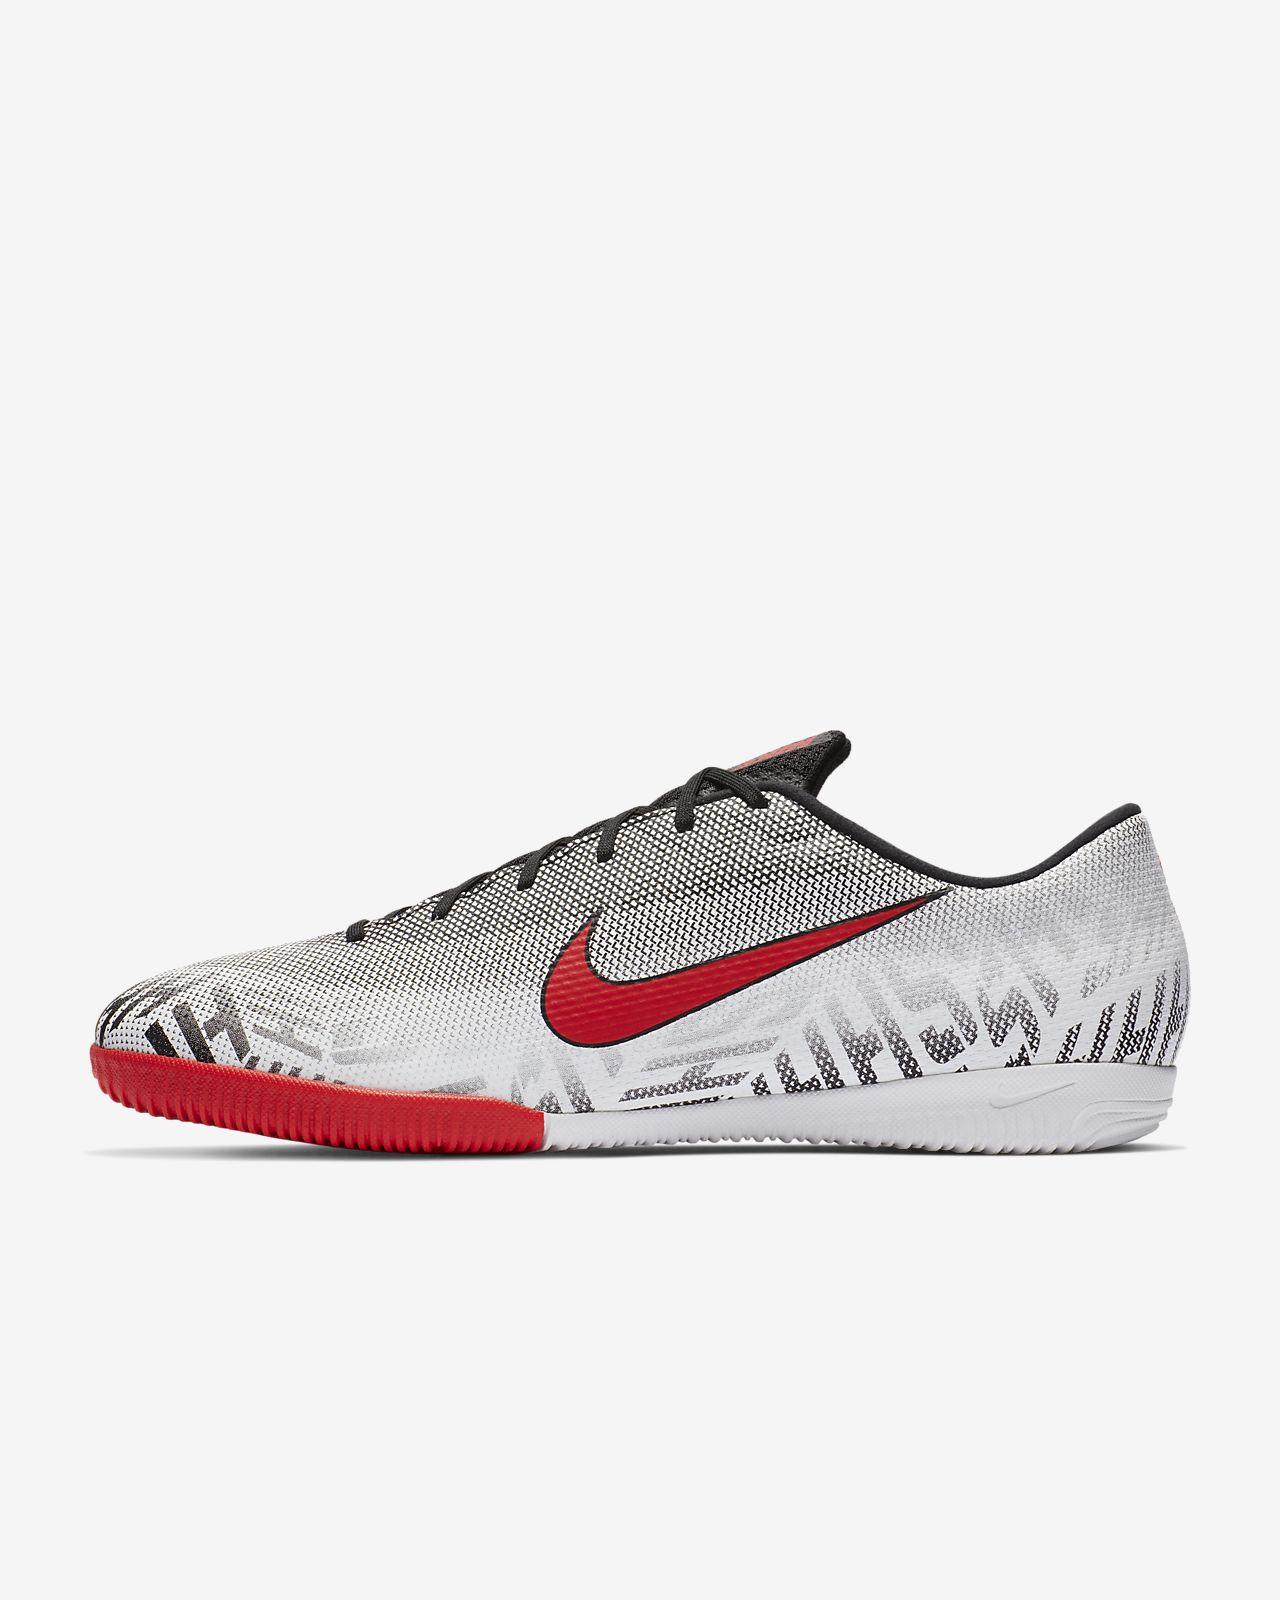 7284584d2e Sapatilhas de futsal Nike Mercurial Vapor XII Academy Neymar Jr ...